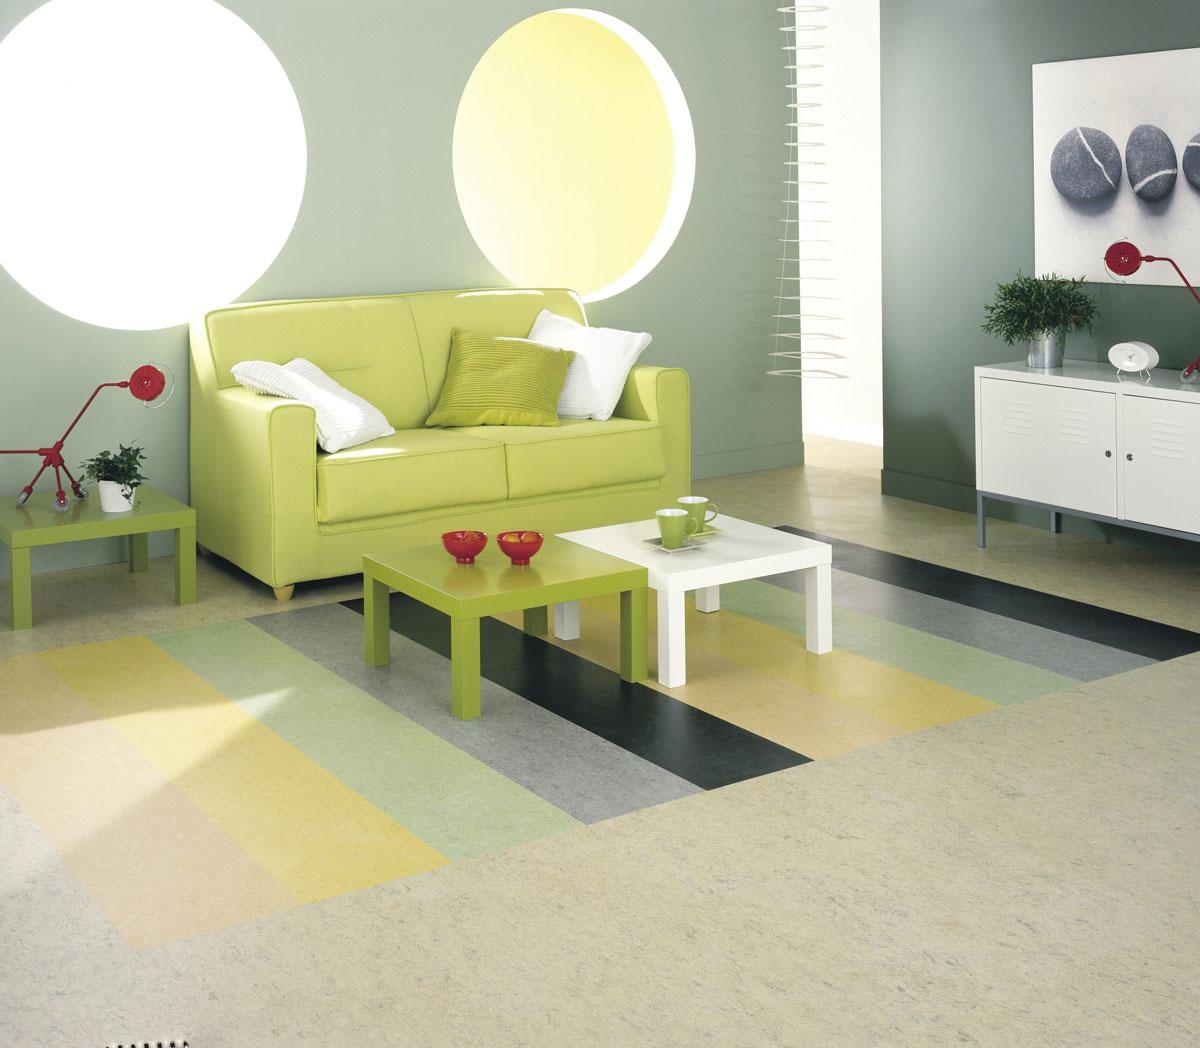 ferrer floors ag parkett in basel reinach bodenbel ge. Black Bedroom Furniture Sets. Home Design Ideas